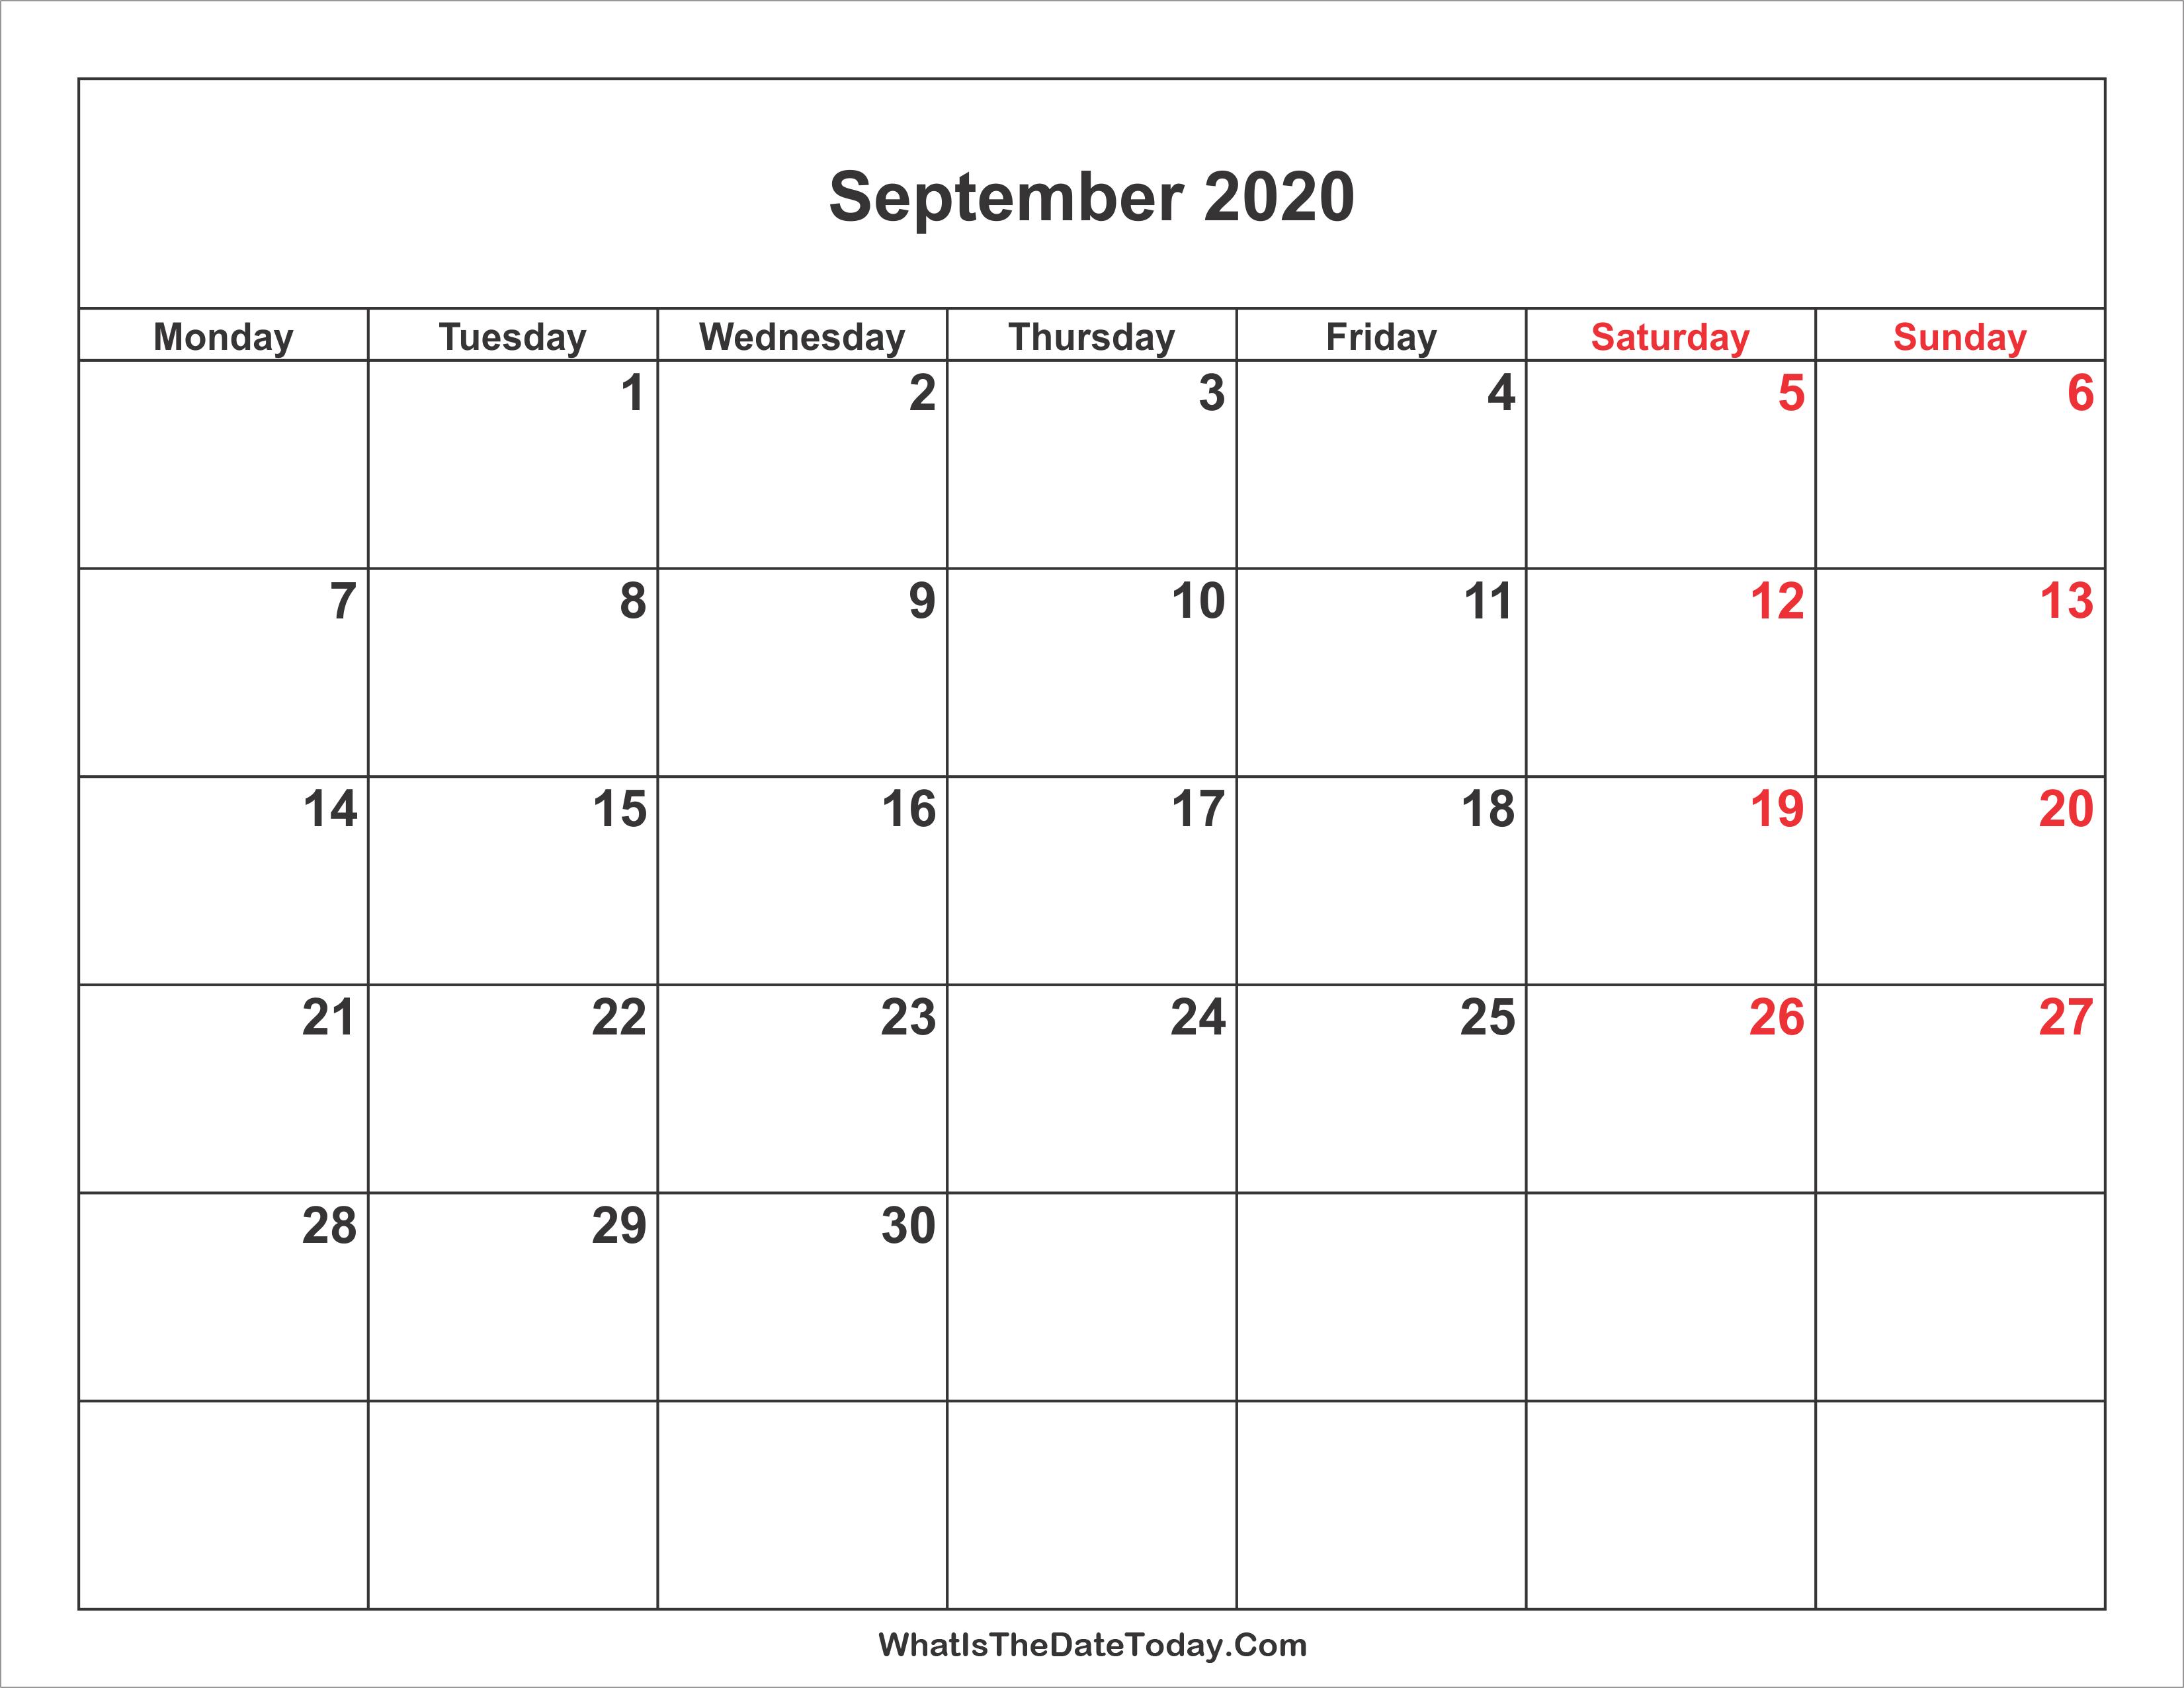 September 2020 Calendar With Holidays September 2020 Calendar with Weekend Highlight